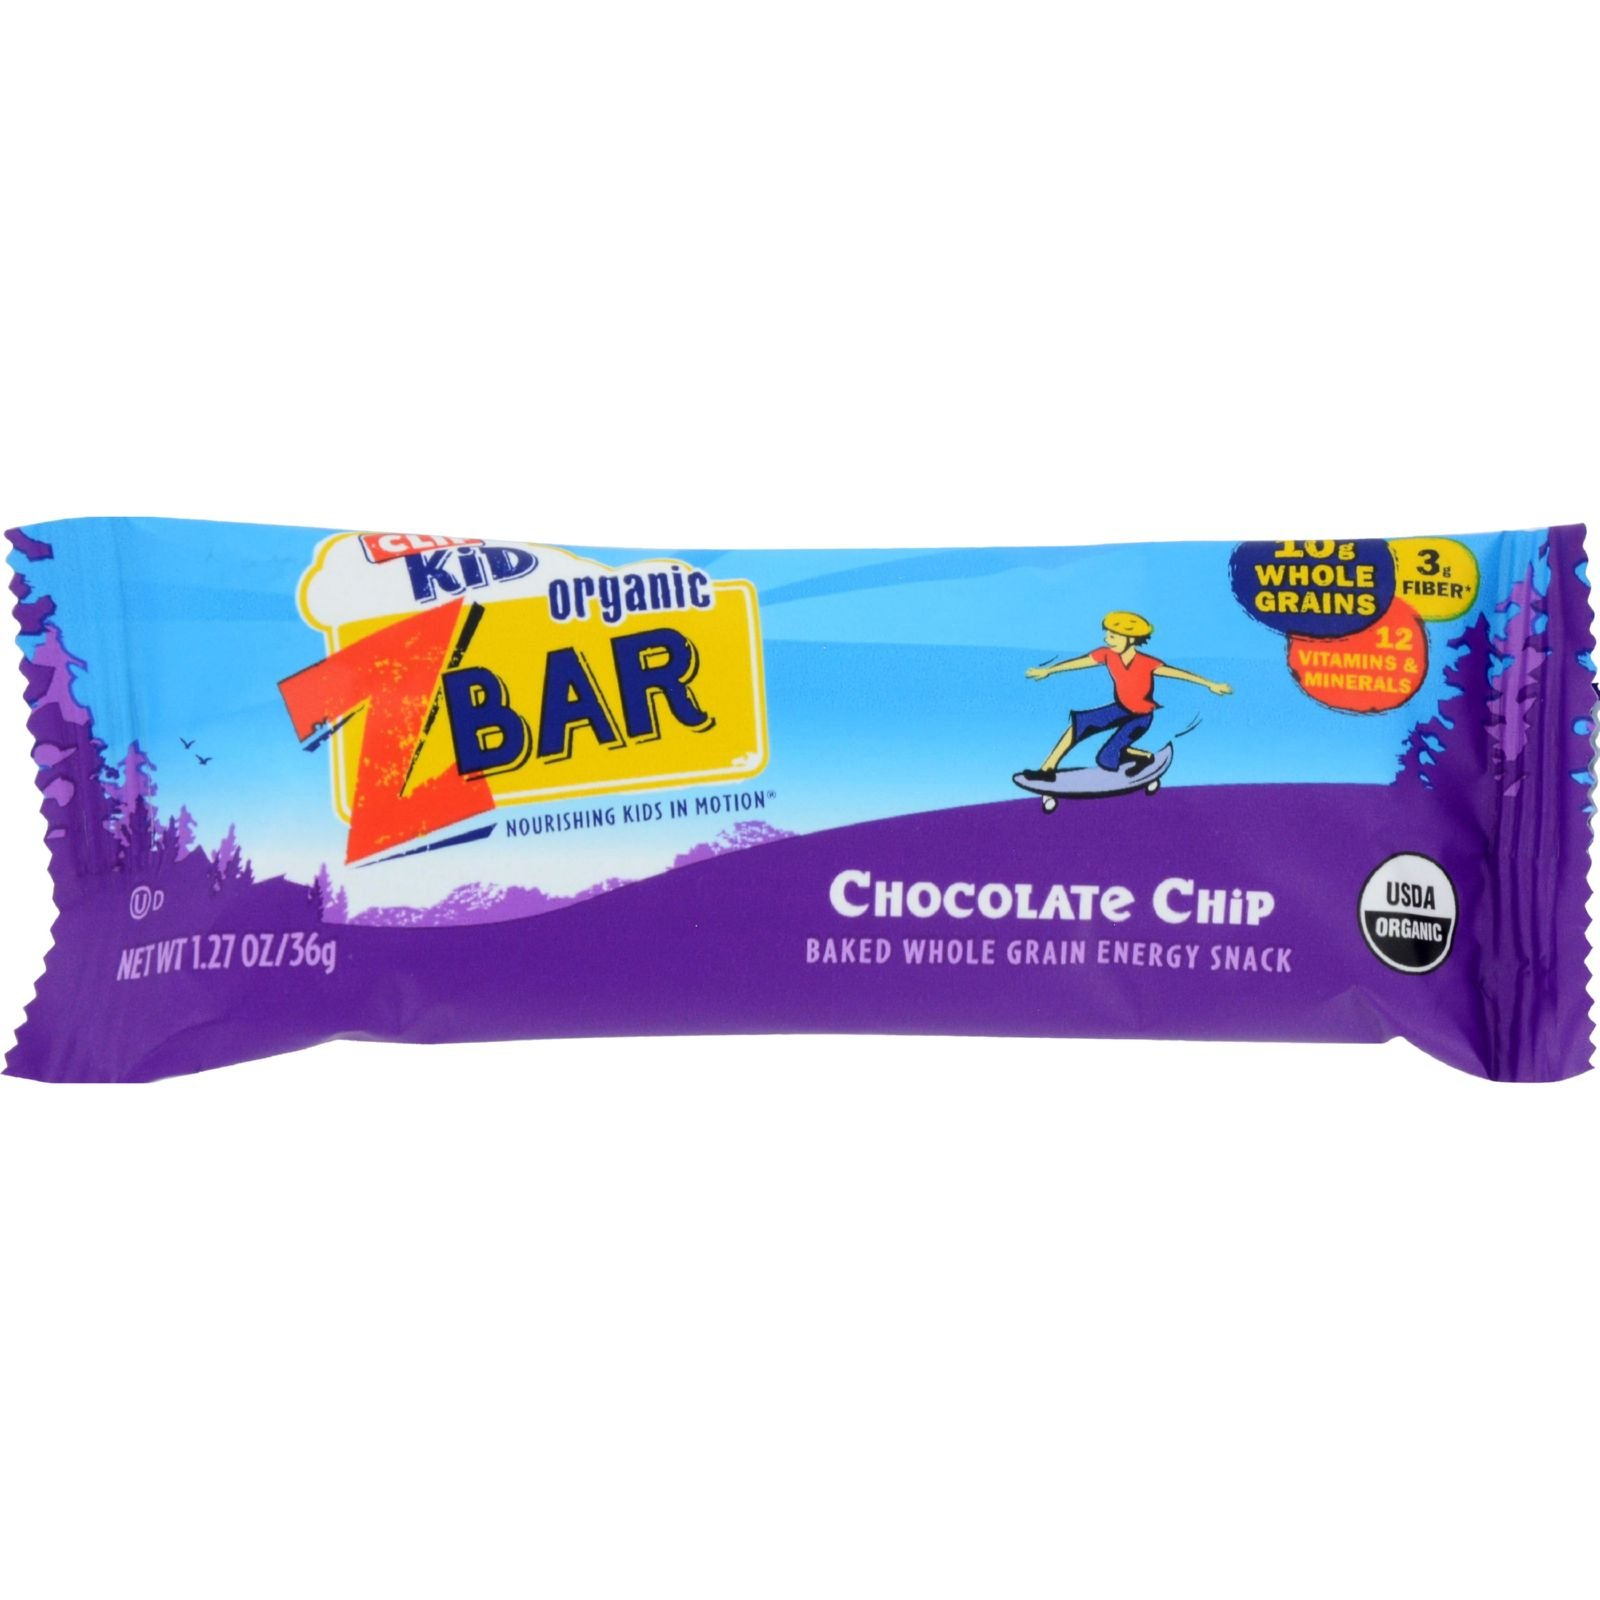 Clif/Zbar Choc Chip Size 1.27z